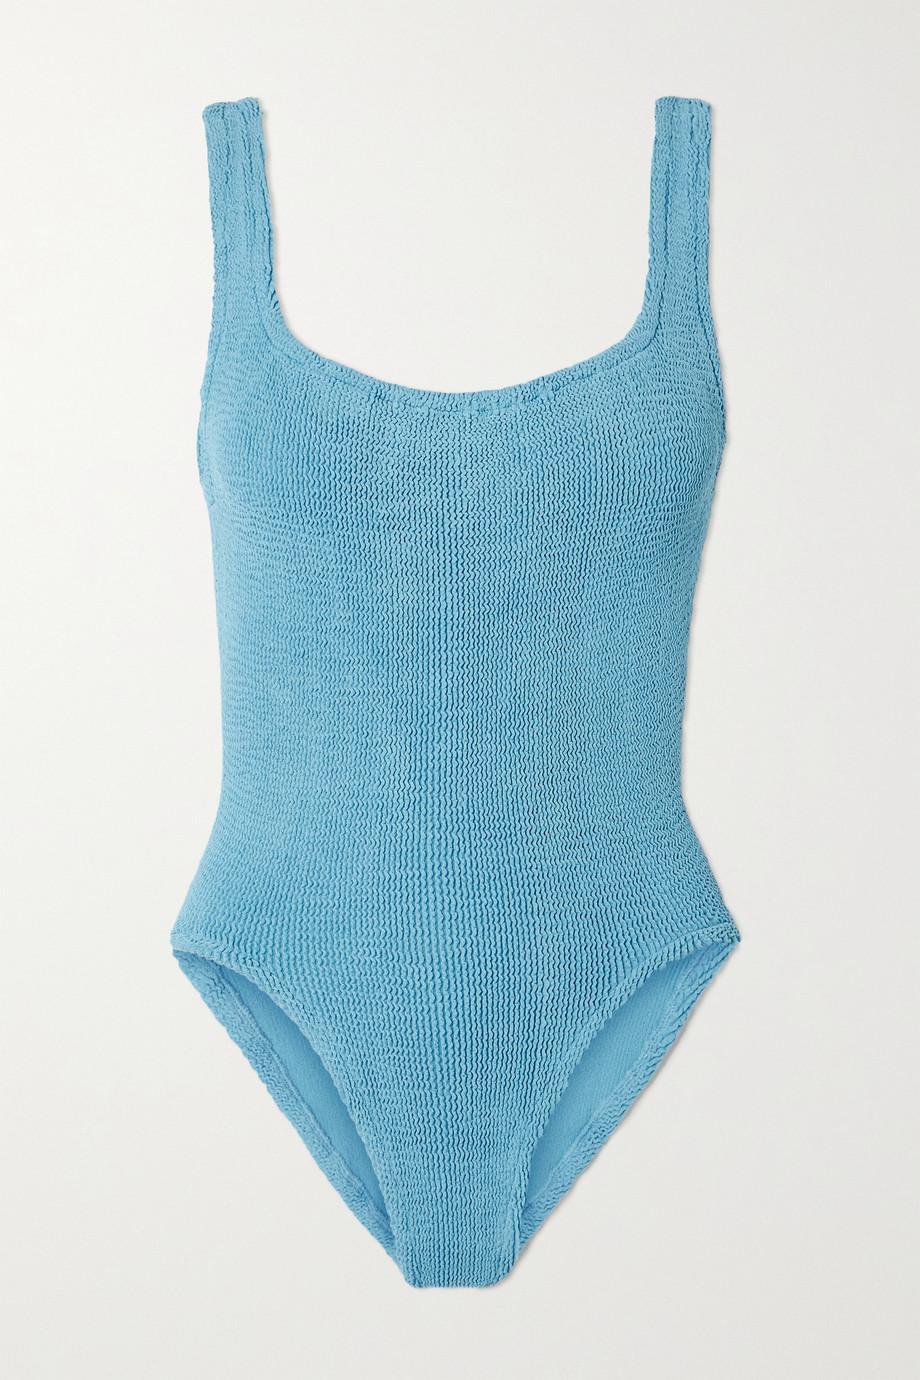 Hunza G + NET SUSTAIN seersucker swimsuit